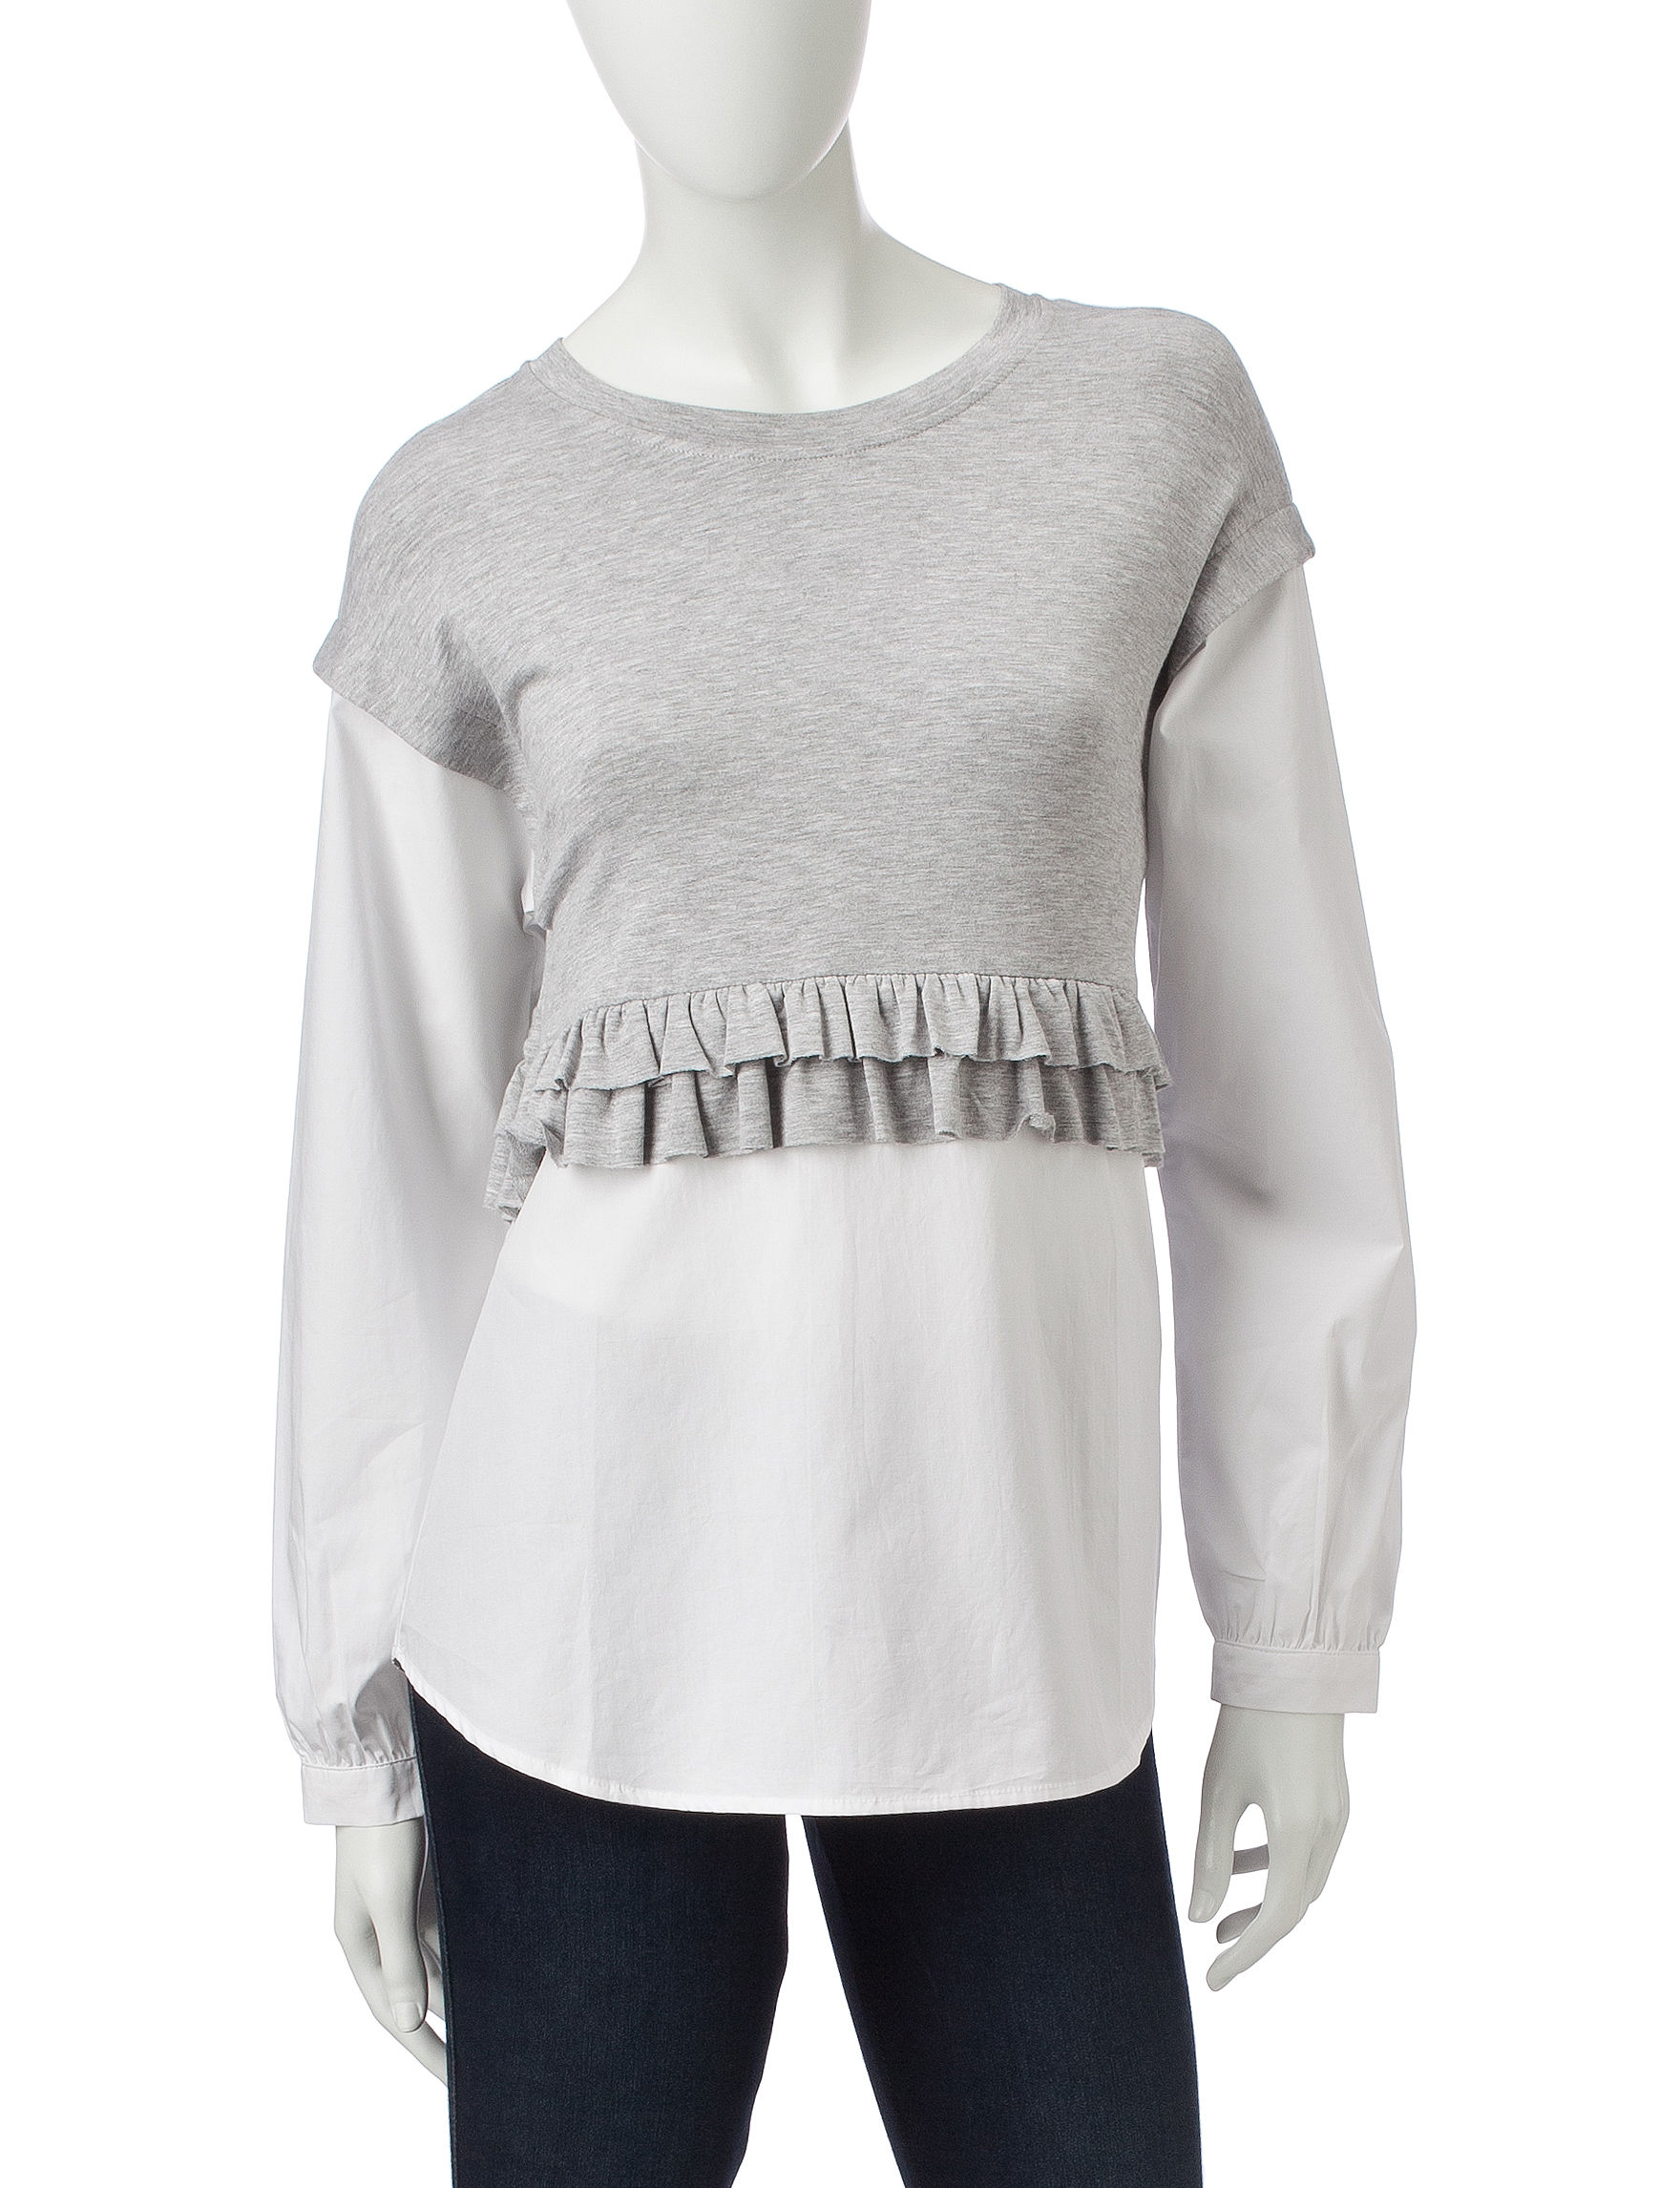 Kensie Heather Grey Shirts & Blouses